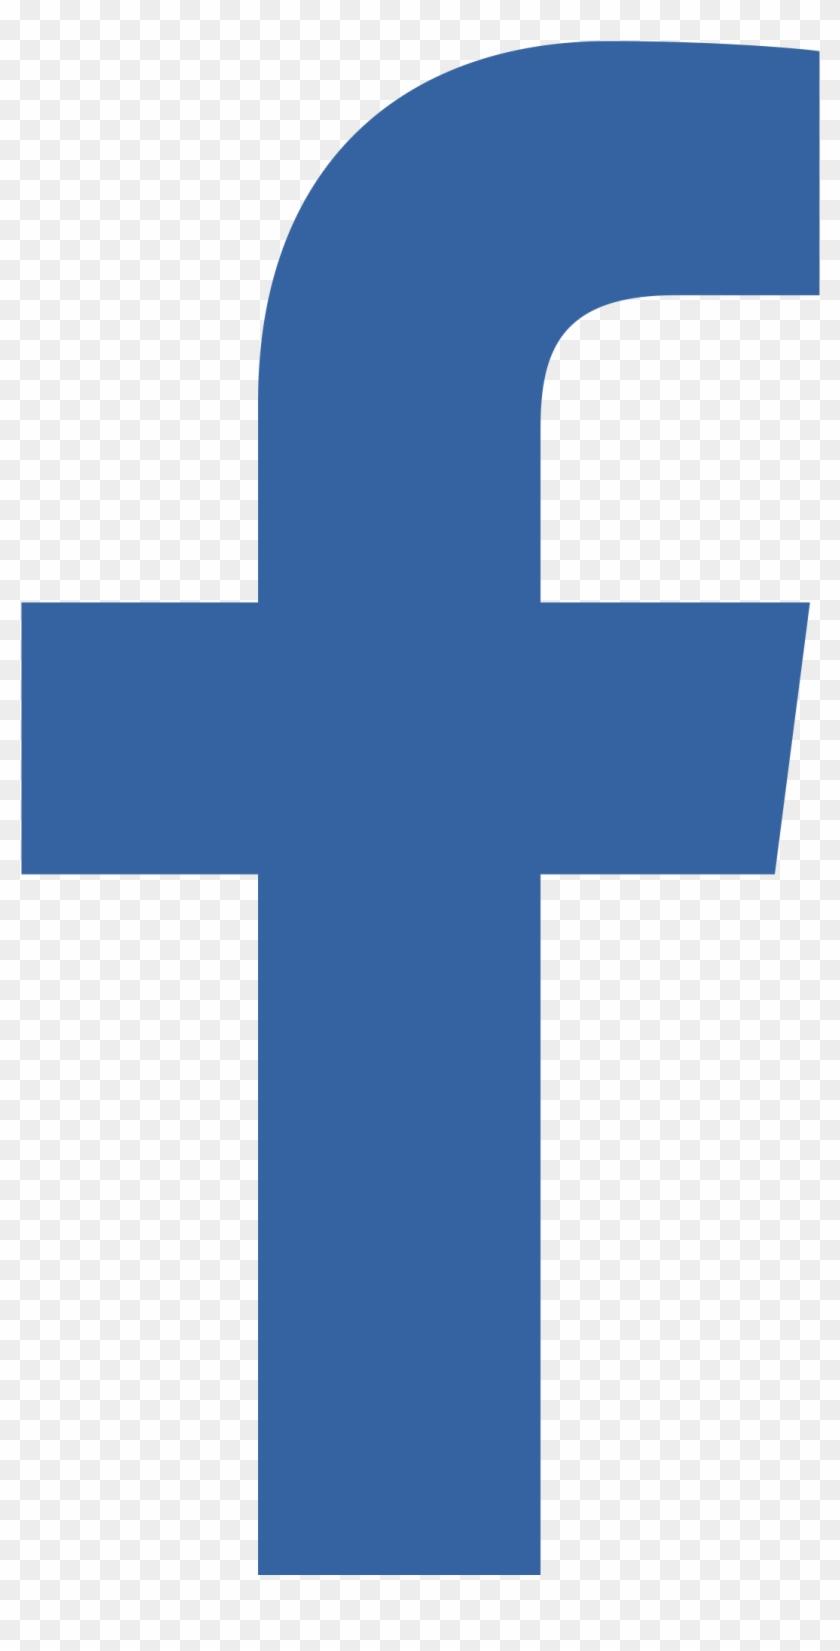 Logo Facebook Png Hd : facebook, Facebook, Download, 2400x2400(#1226568), PngFind